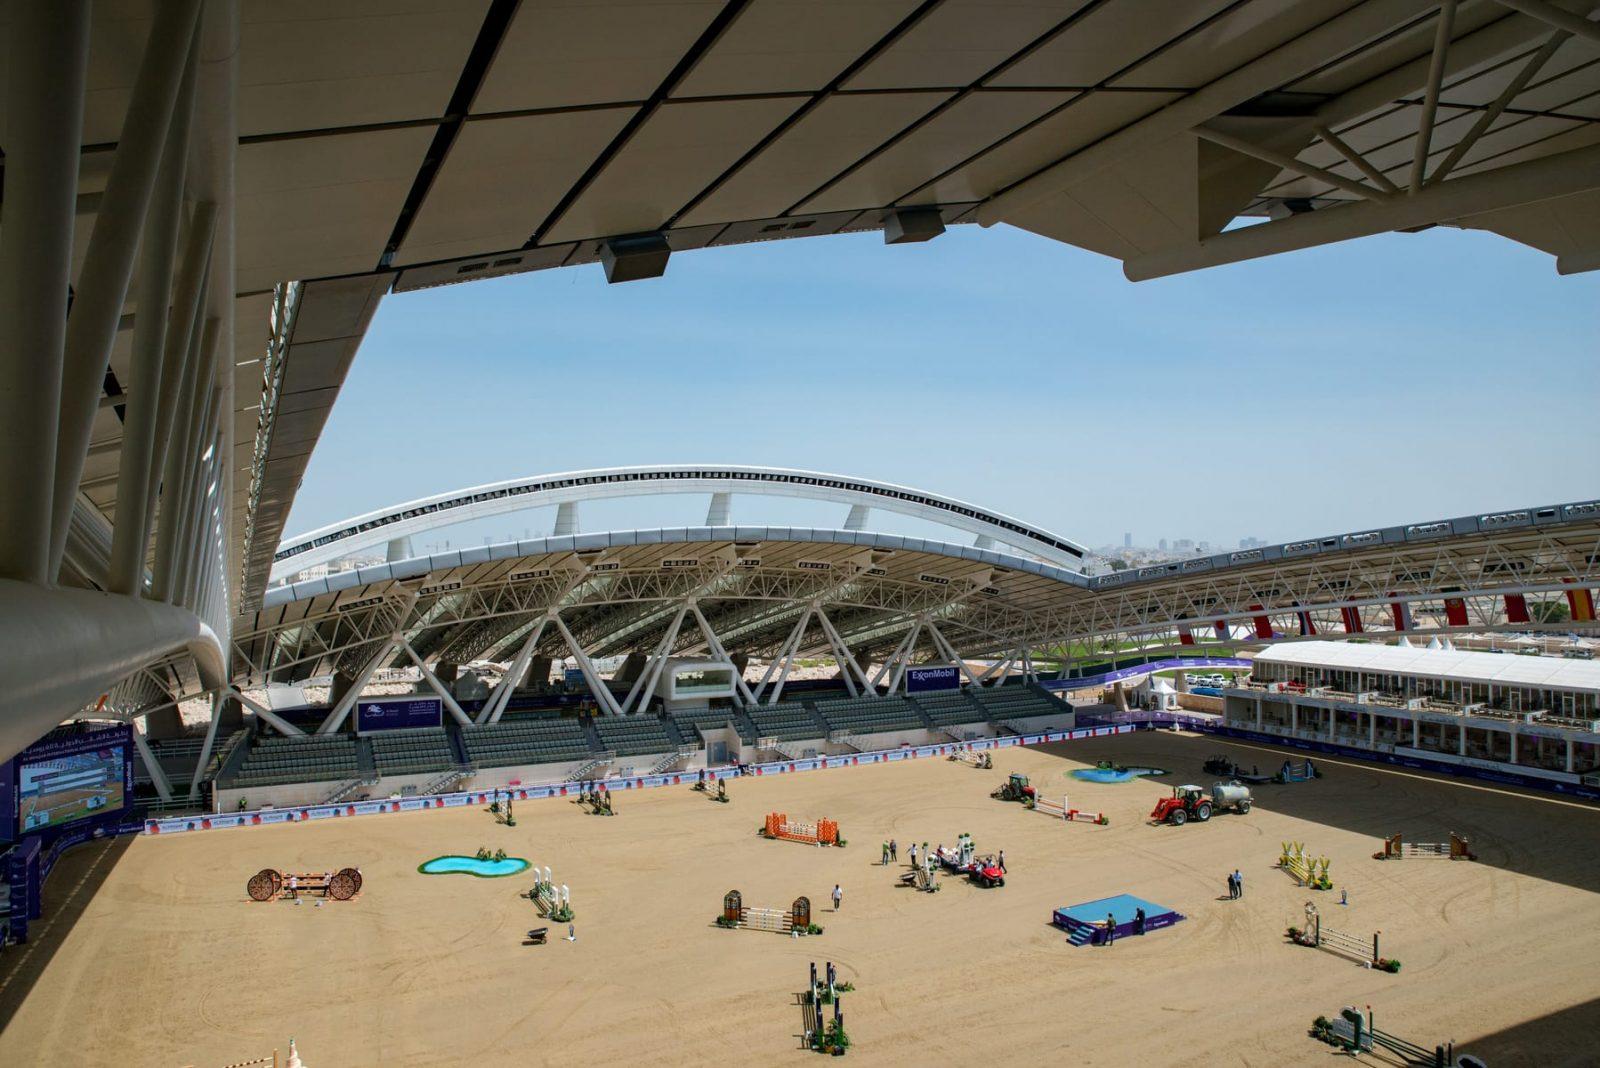 Die imposante Arena